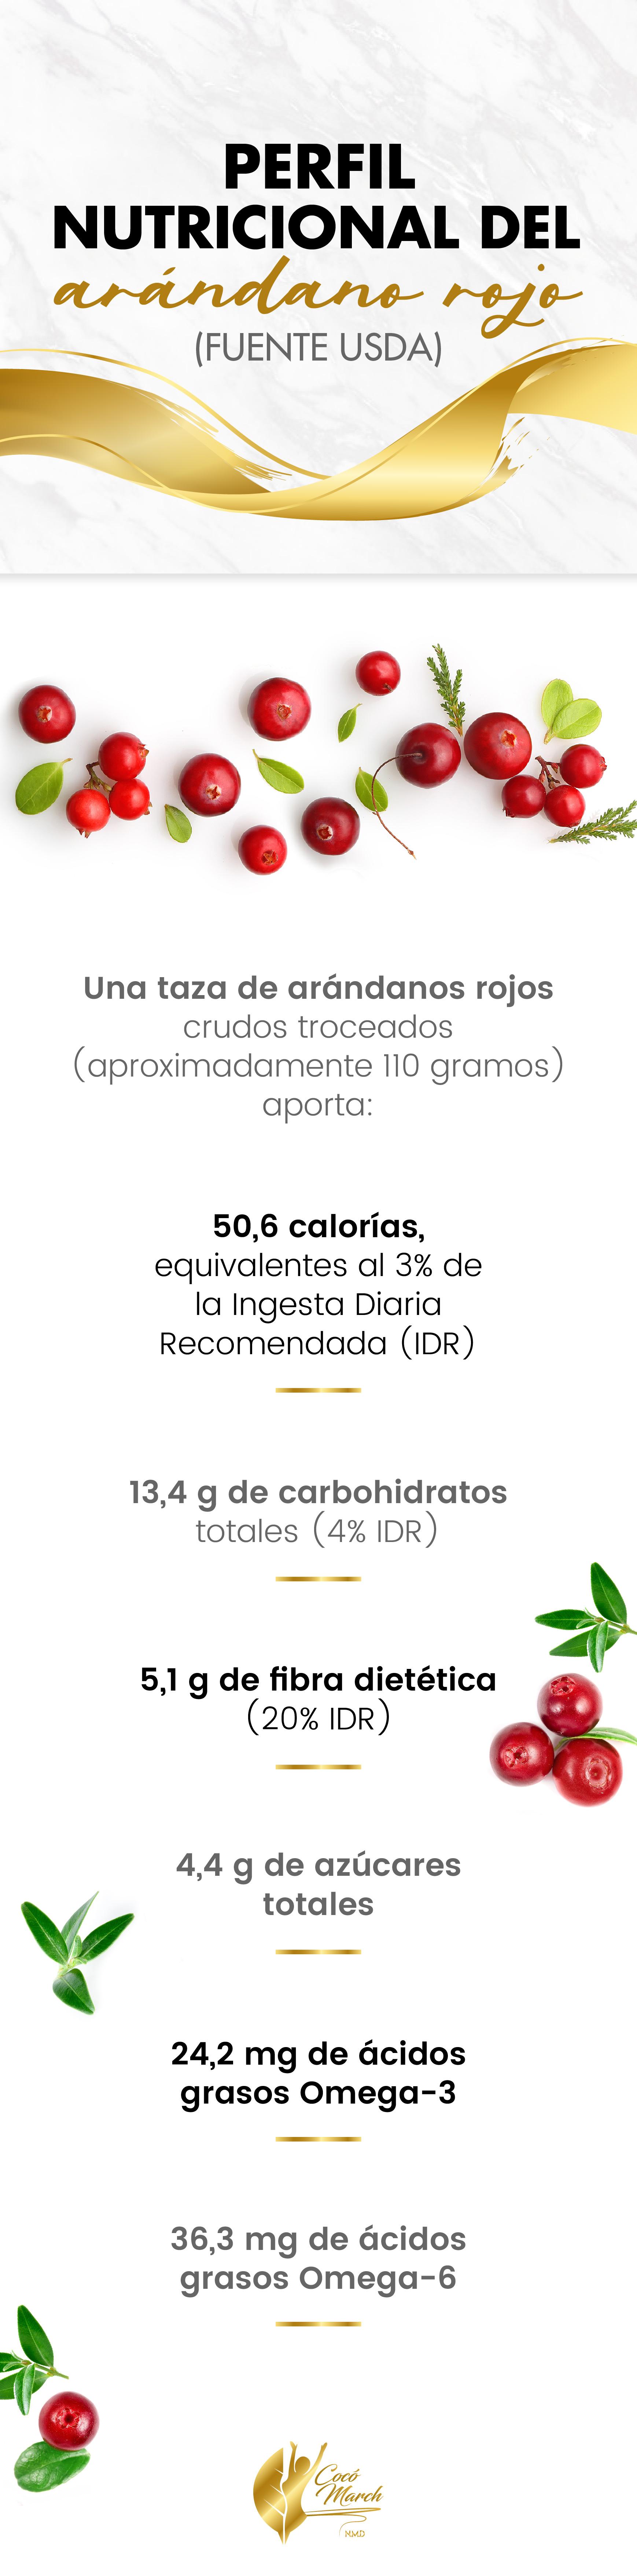 perfil-nutricional-del-arandano-rojo